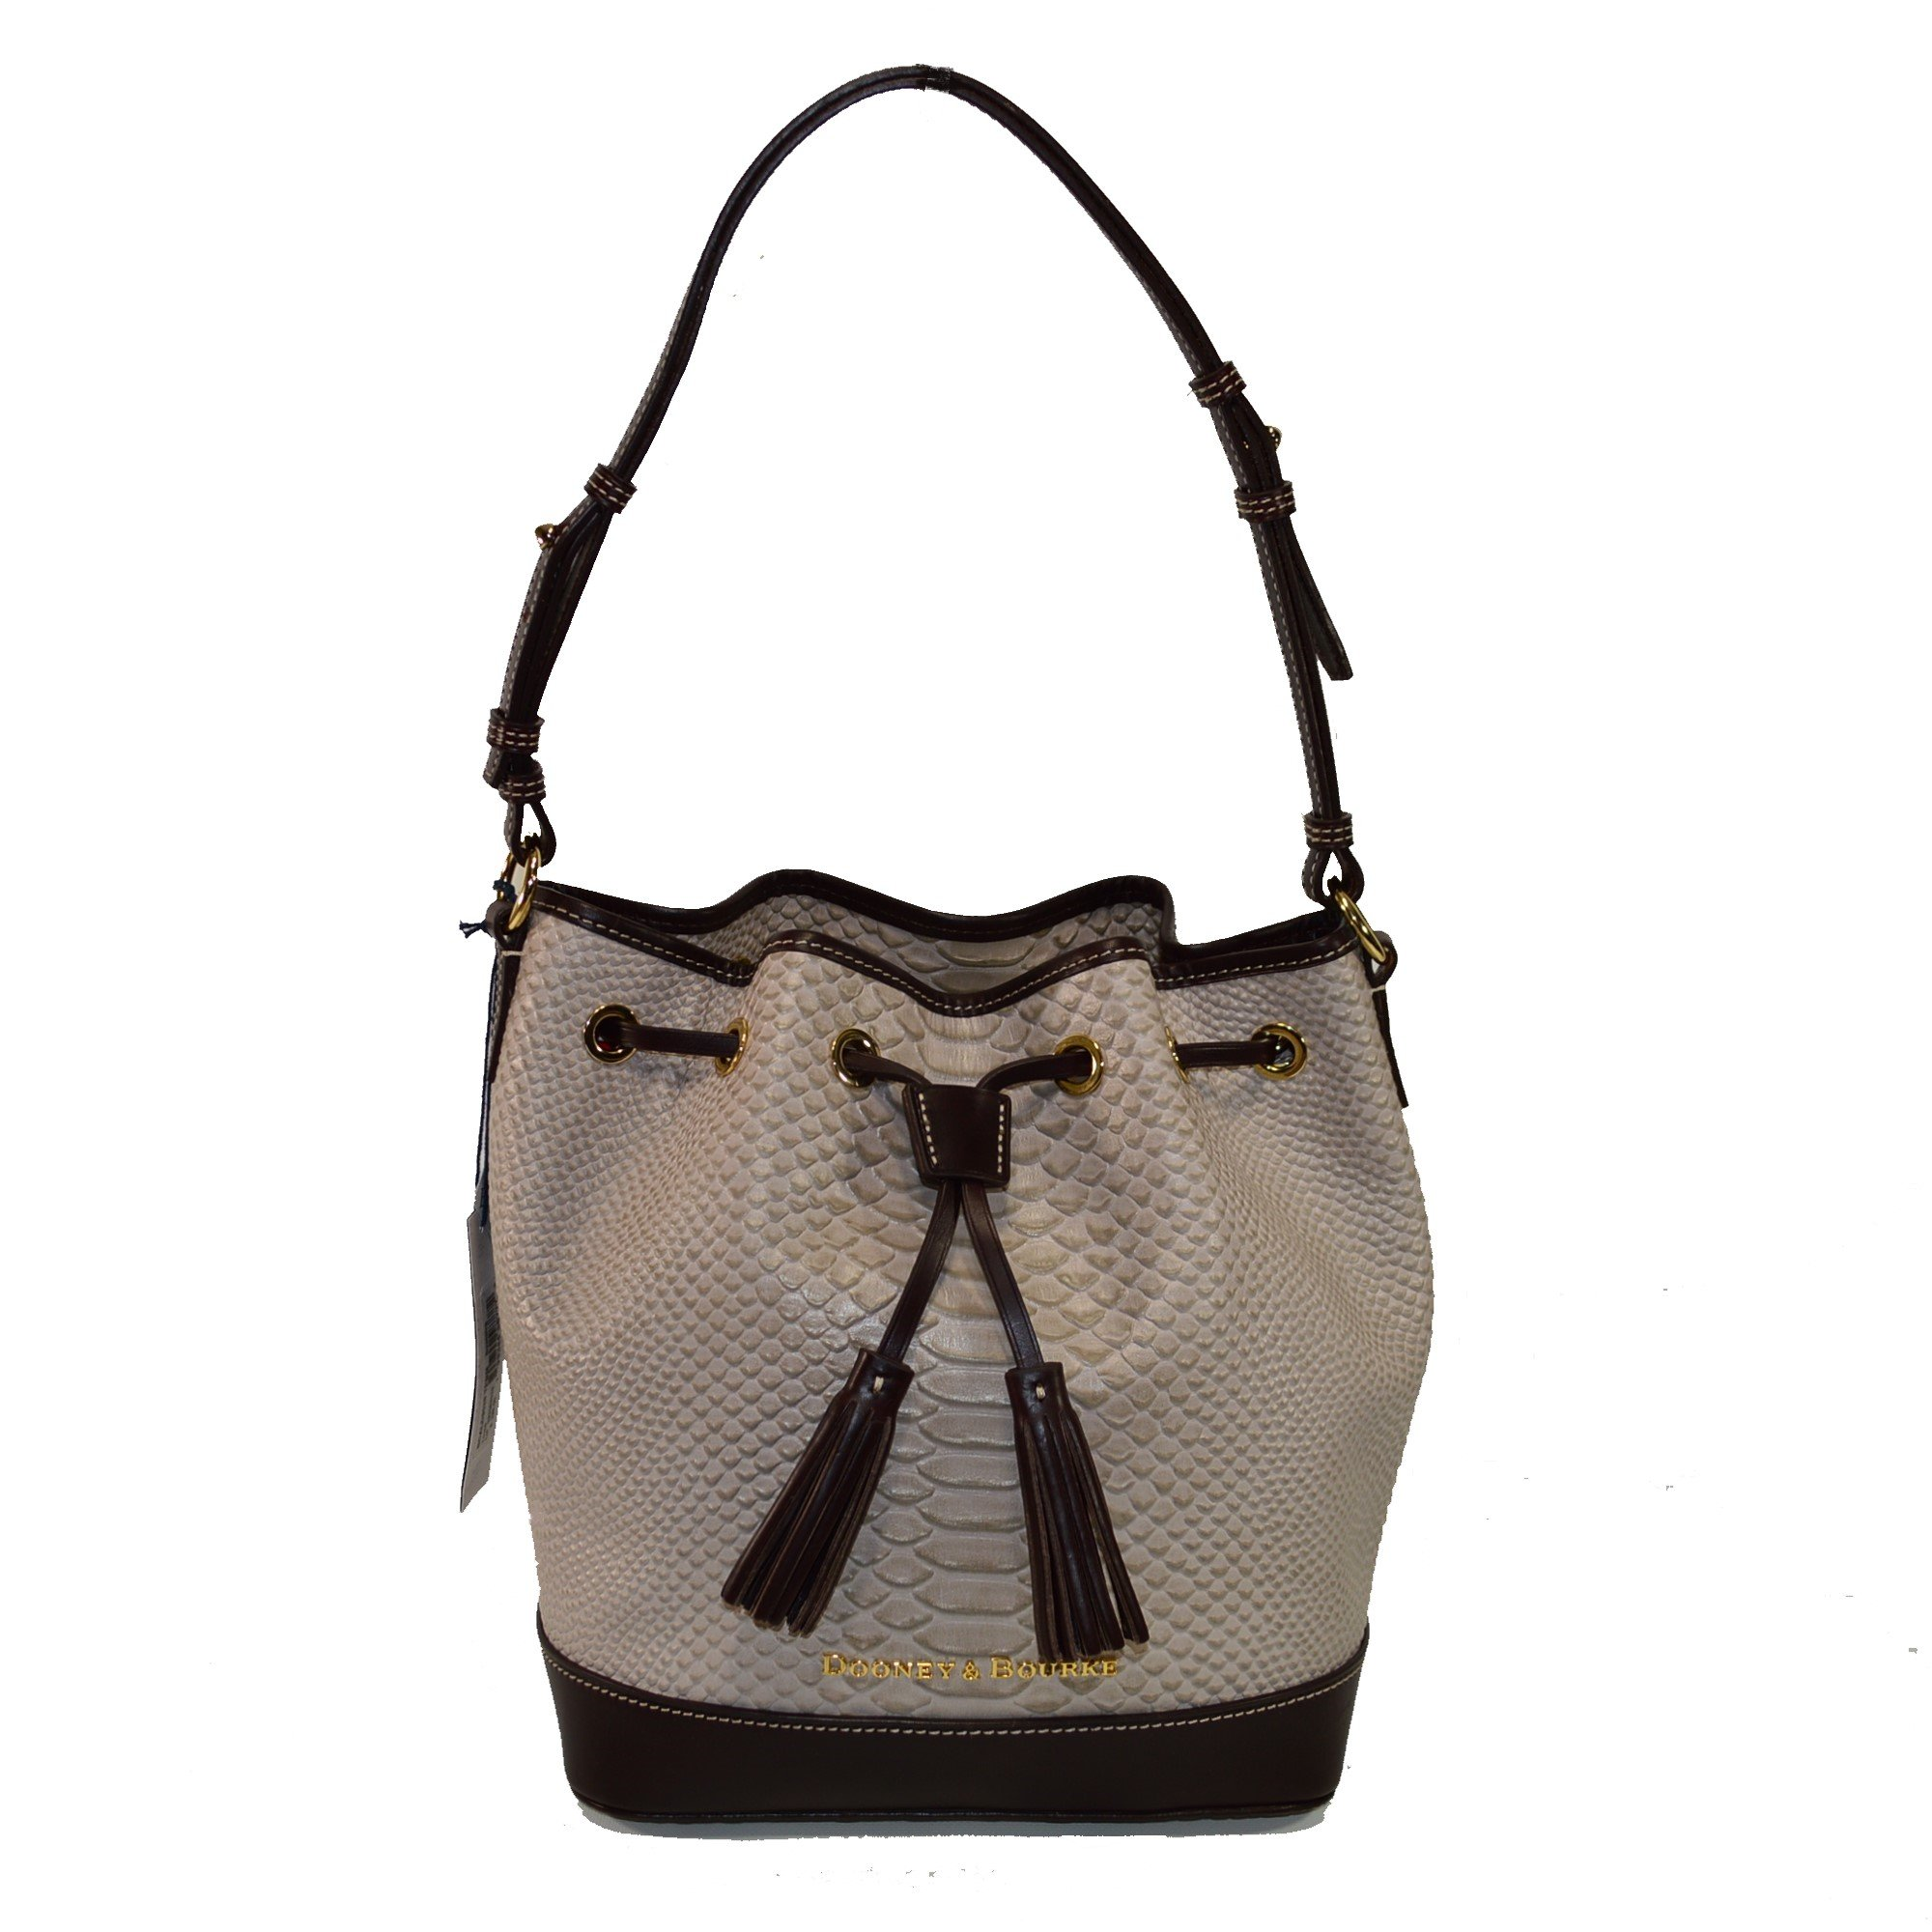 Dooney & Bourke Cordova Leather Drawstring Bag BCALD9038 Taupe